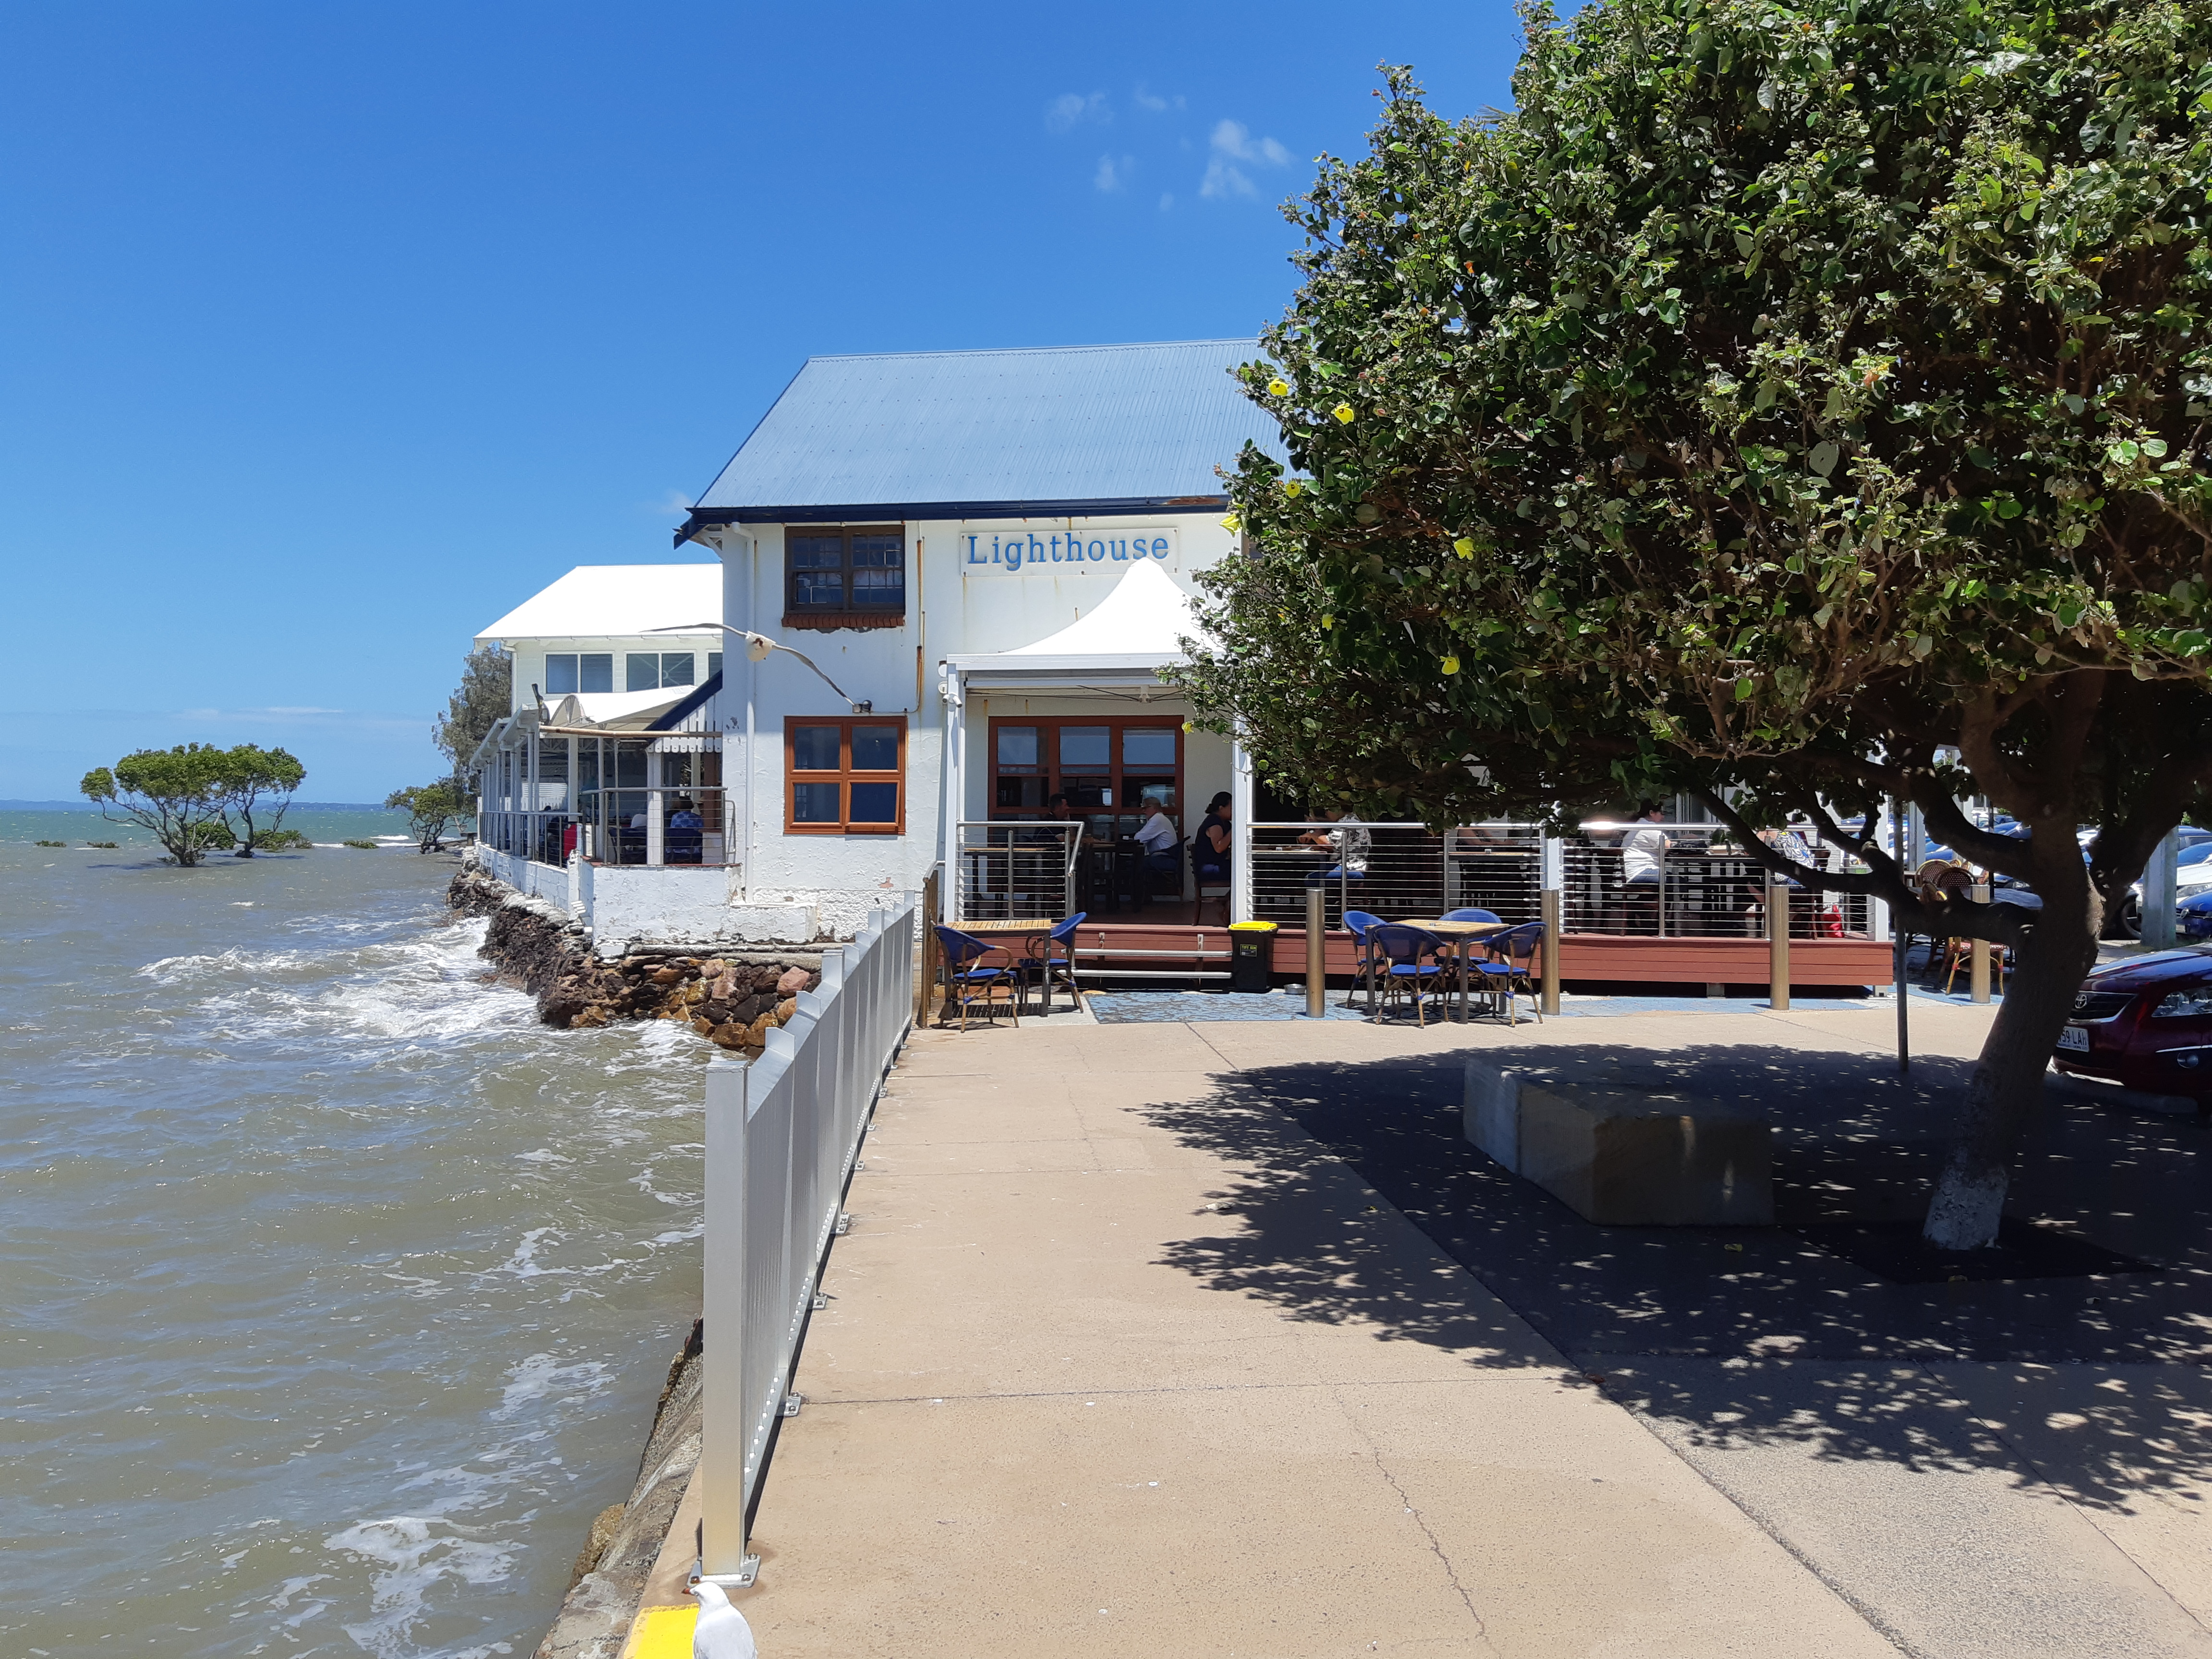 Walk Along the Promenade - Lighthouse Cafe